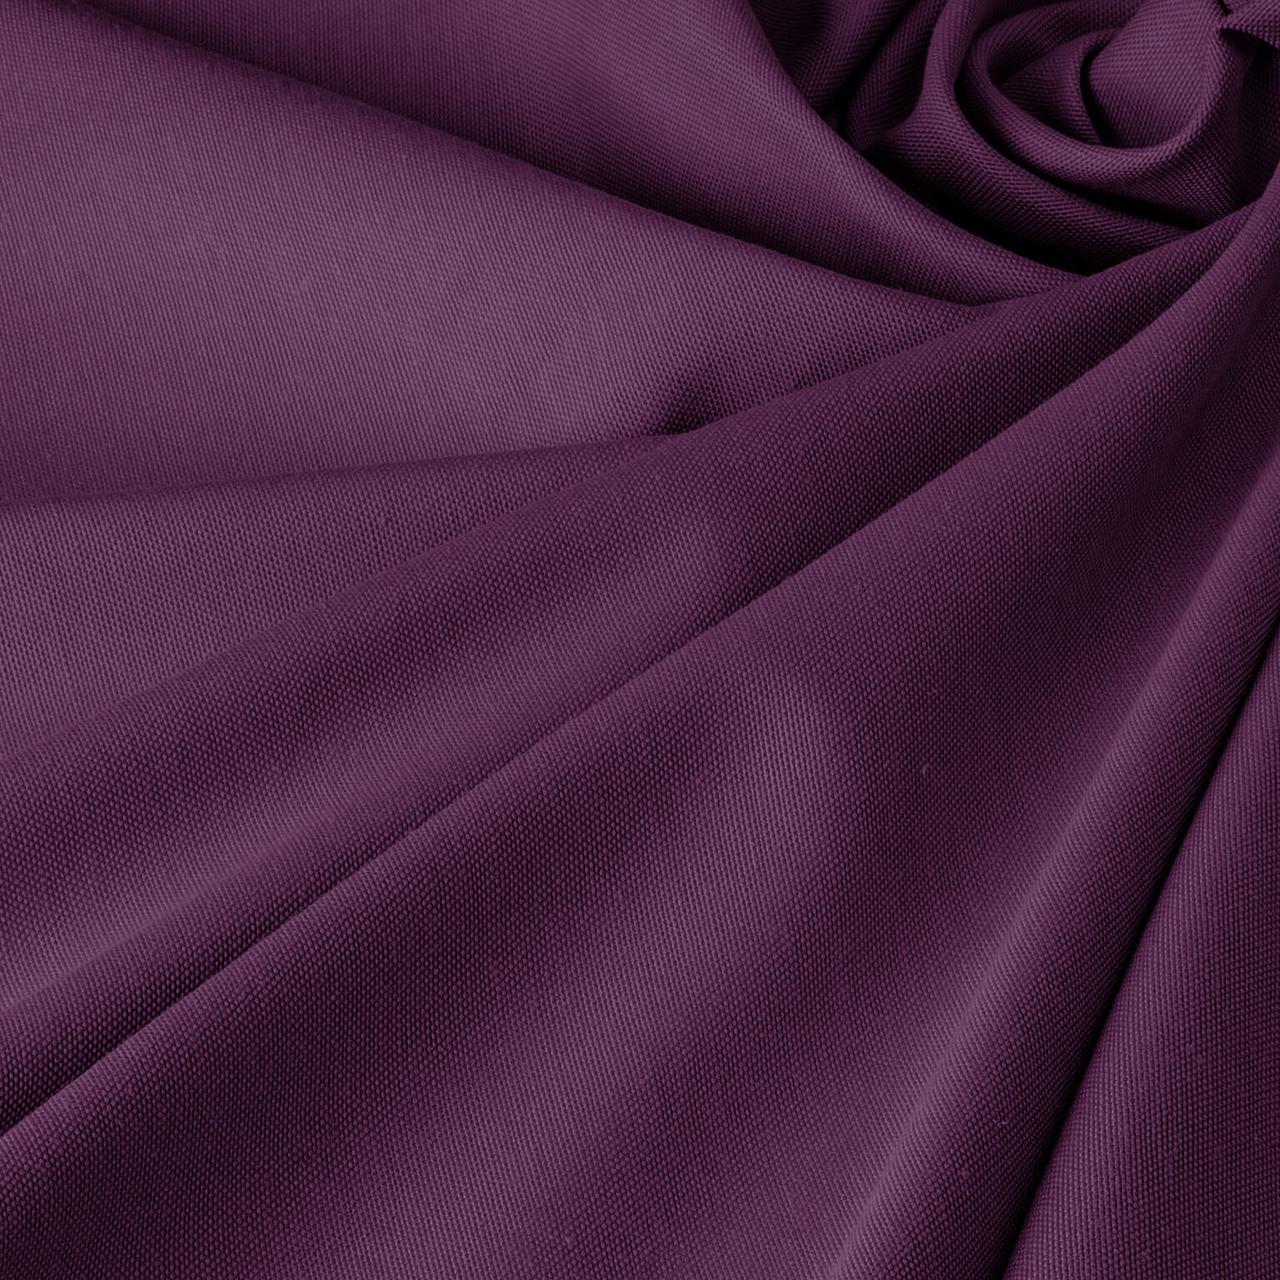 Ткань для штор и скатертей Teflon 81018